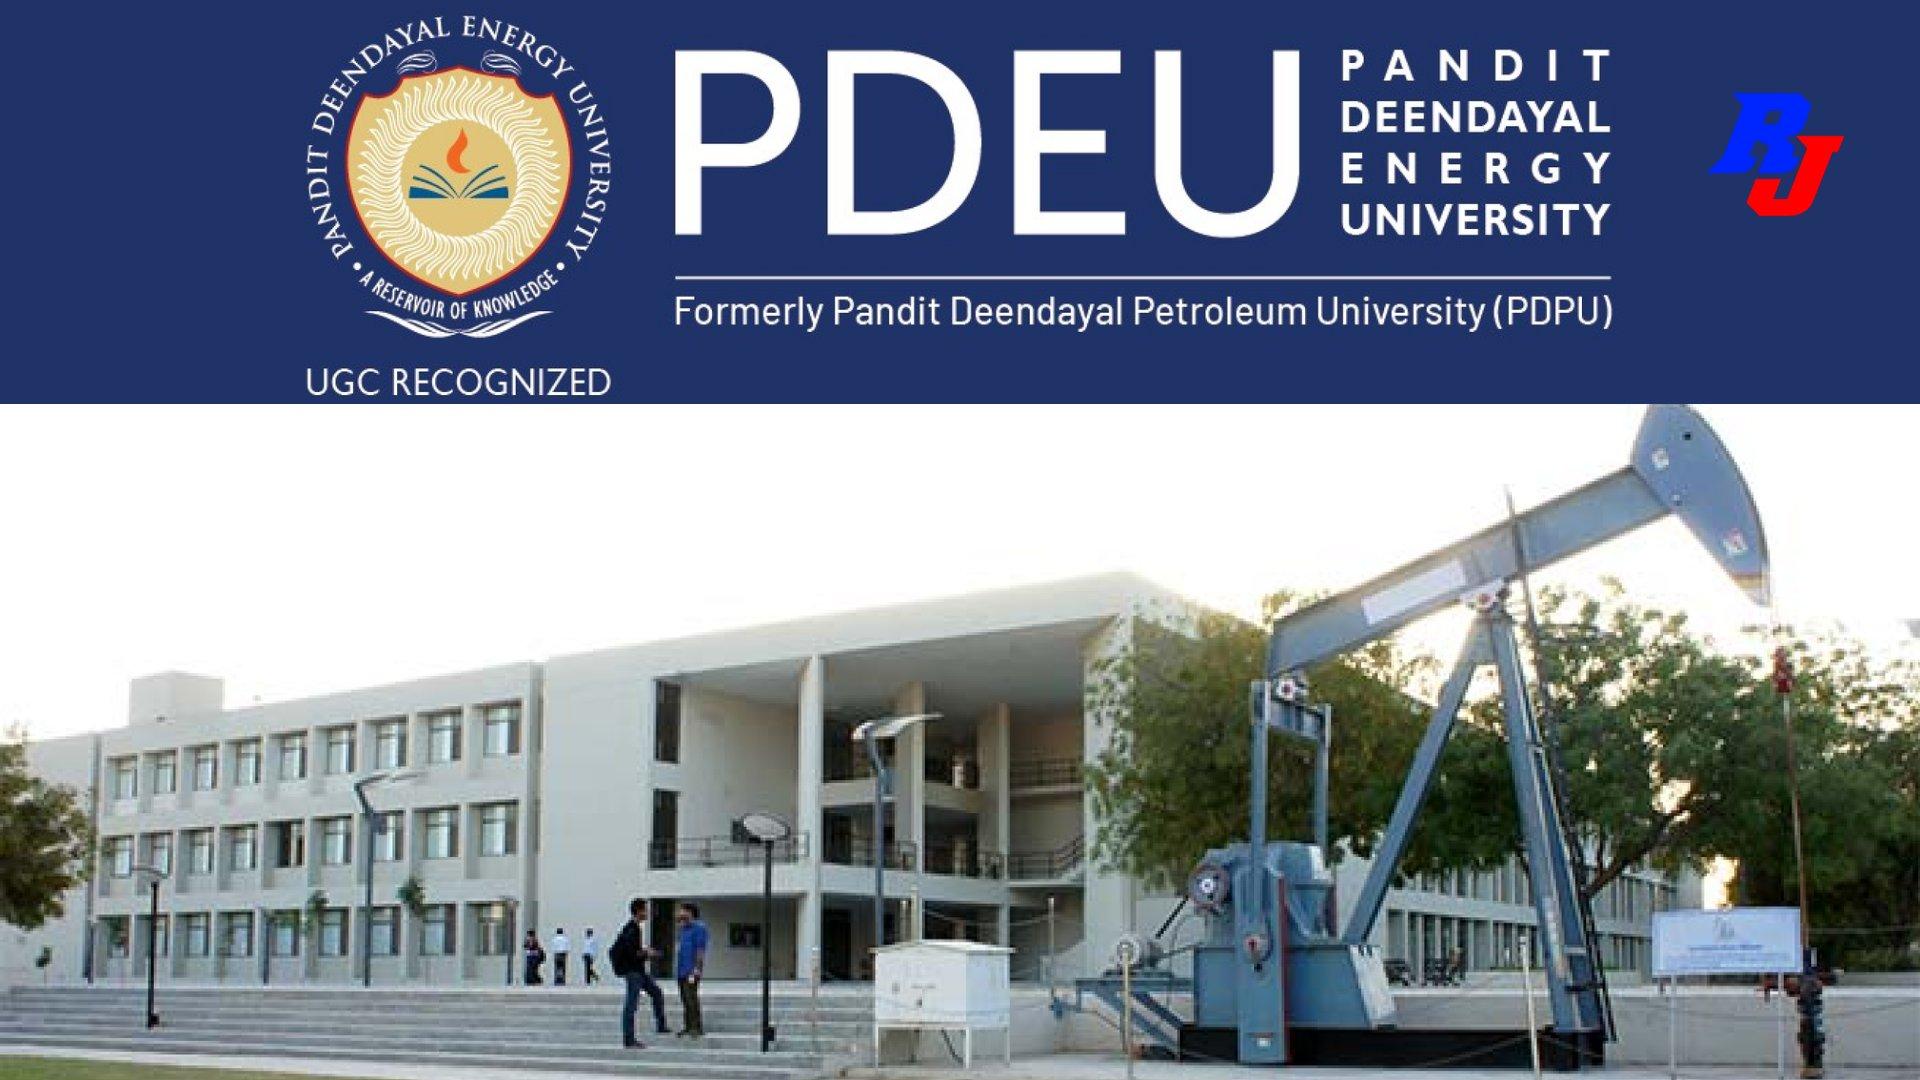 Research Associate Position in PDEU, Pandit Deendayal Energy University, Gujarat, India